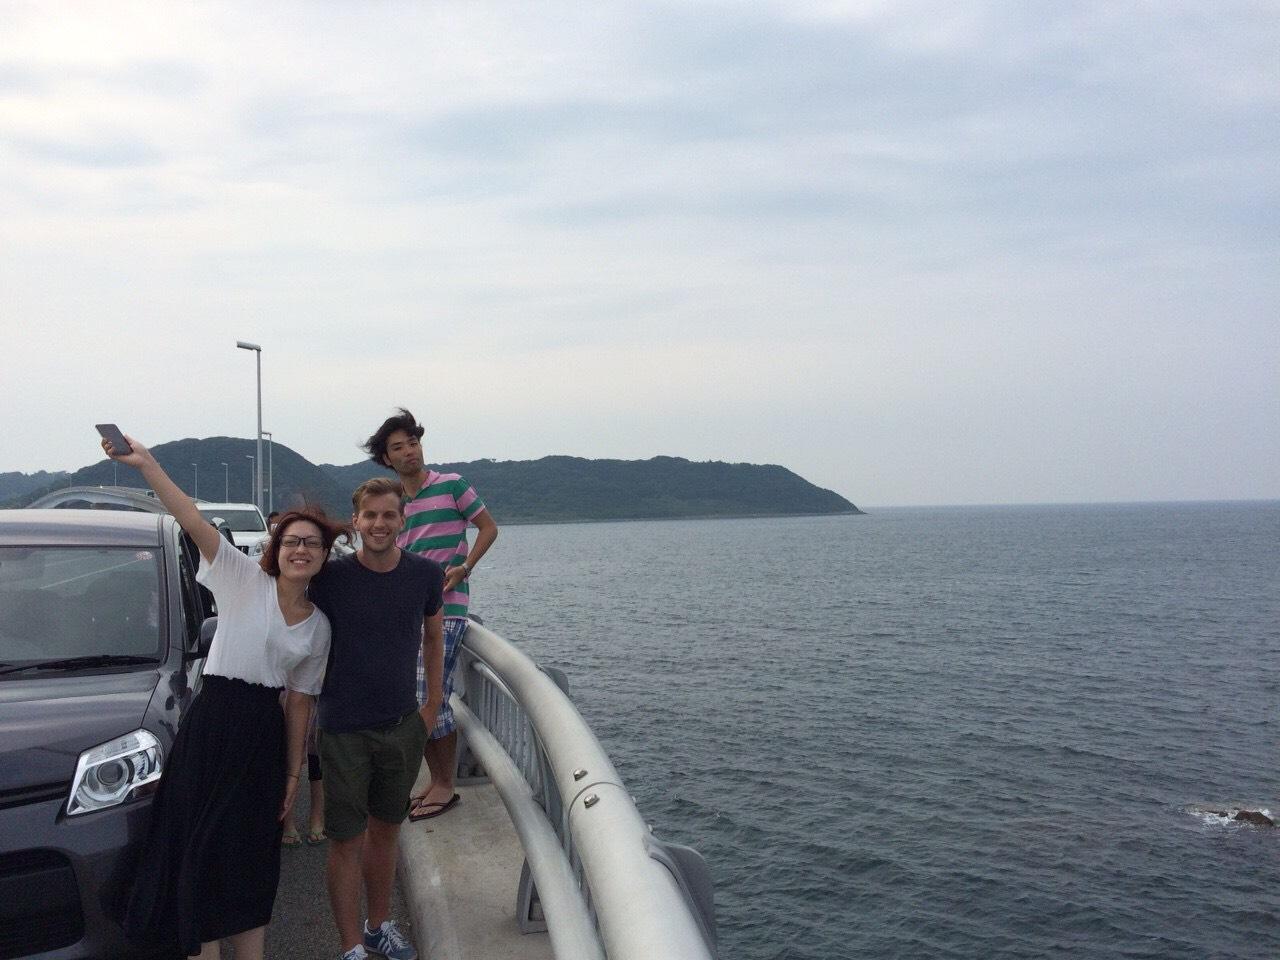 On our way back to Hiroshima from Tsunoshima